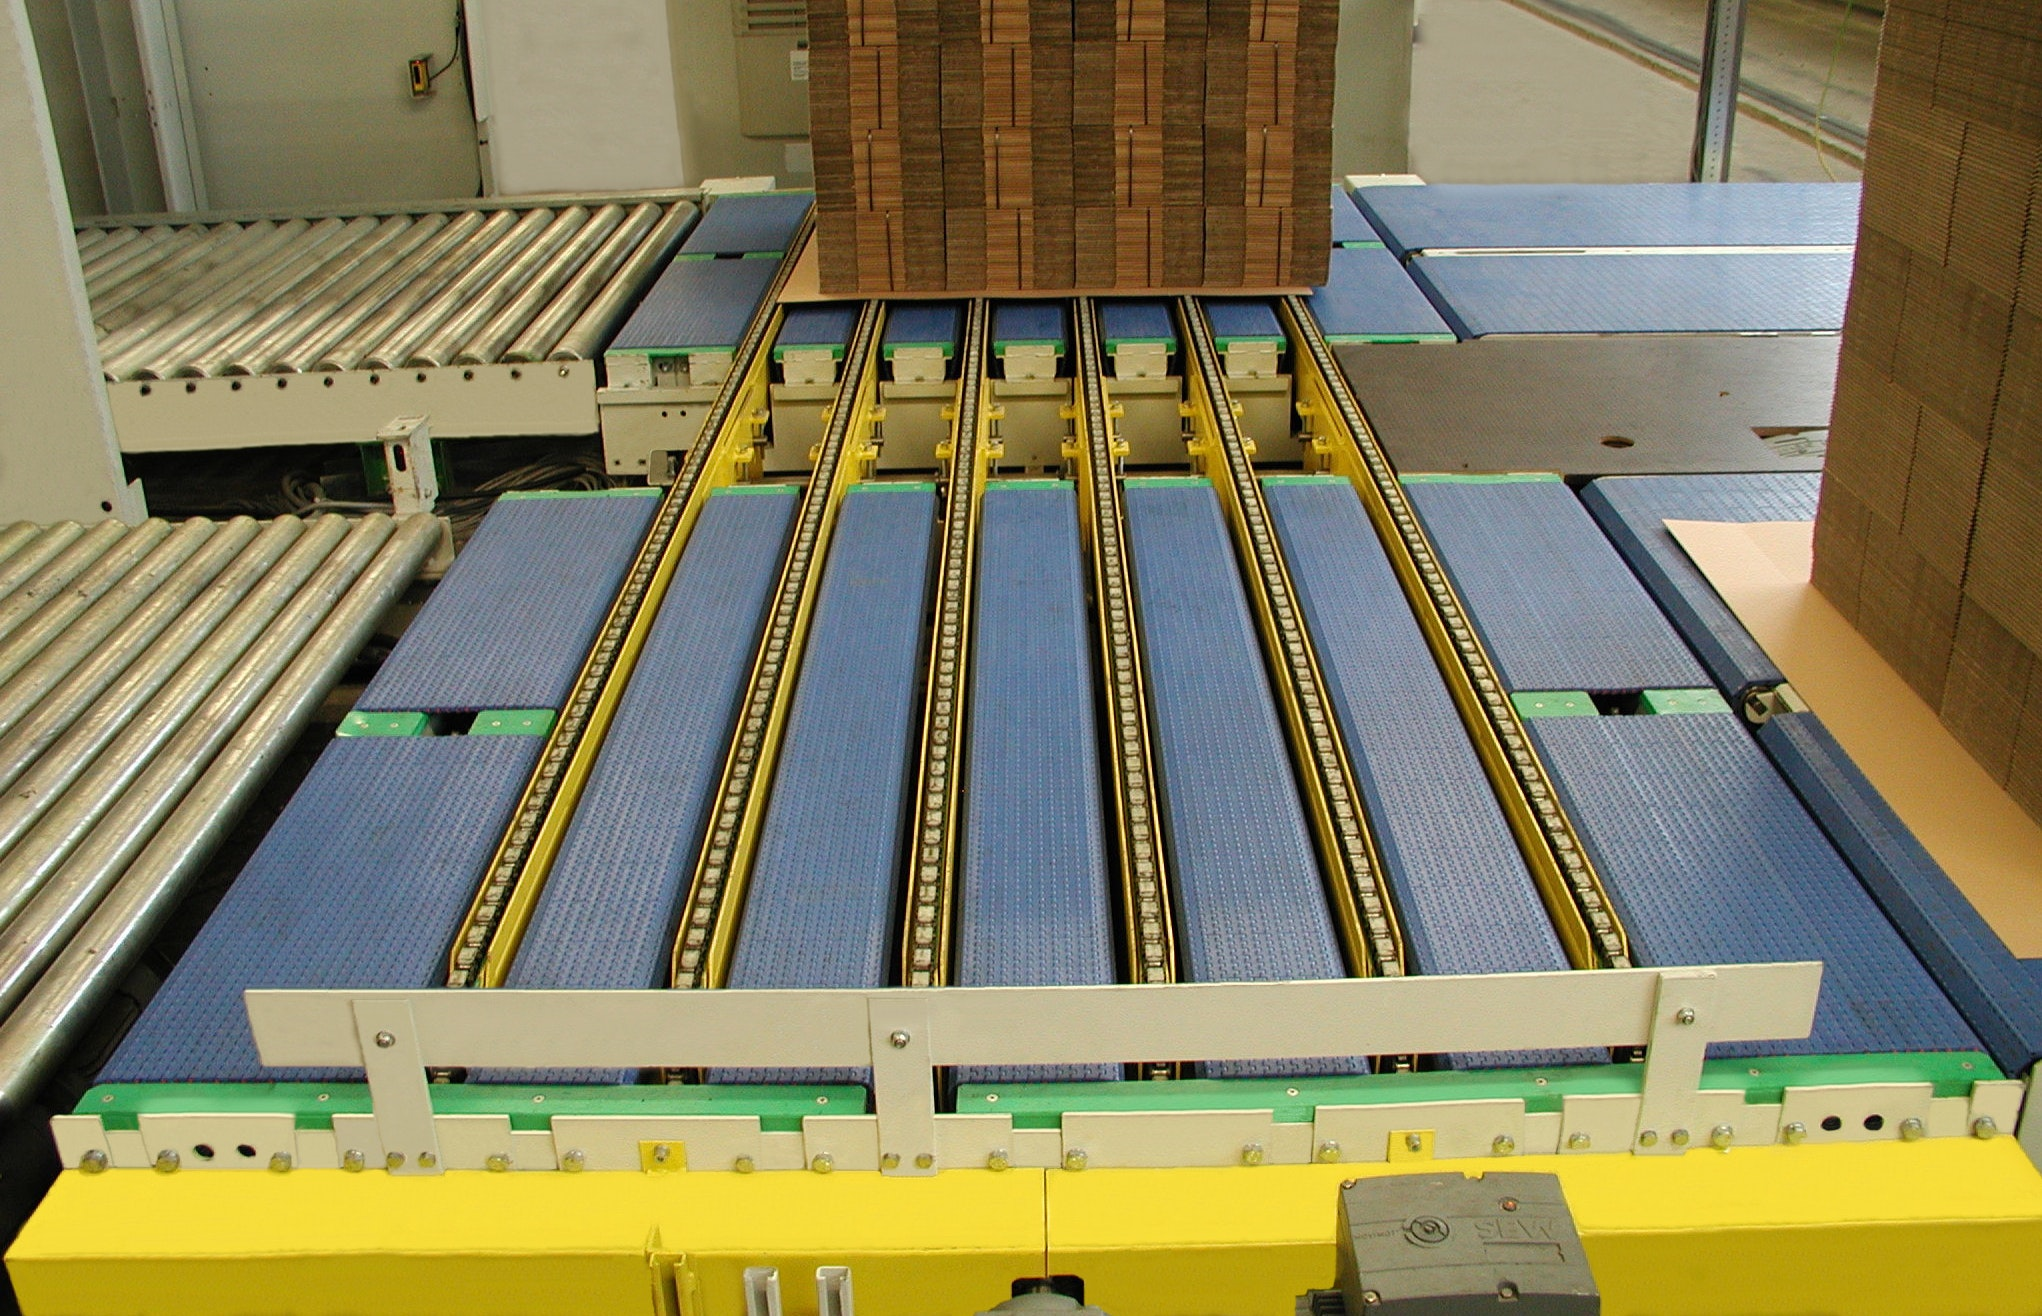 Angular transfer unit; combination plastic chain conveyor - chain conveyor